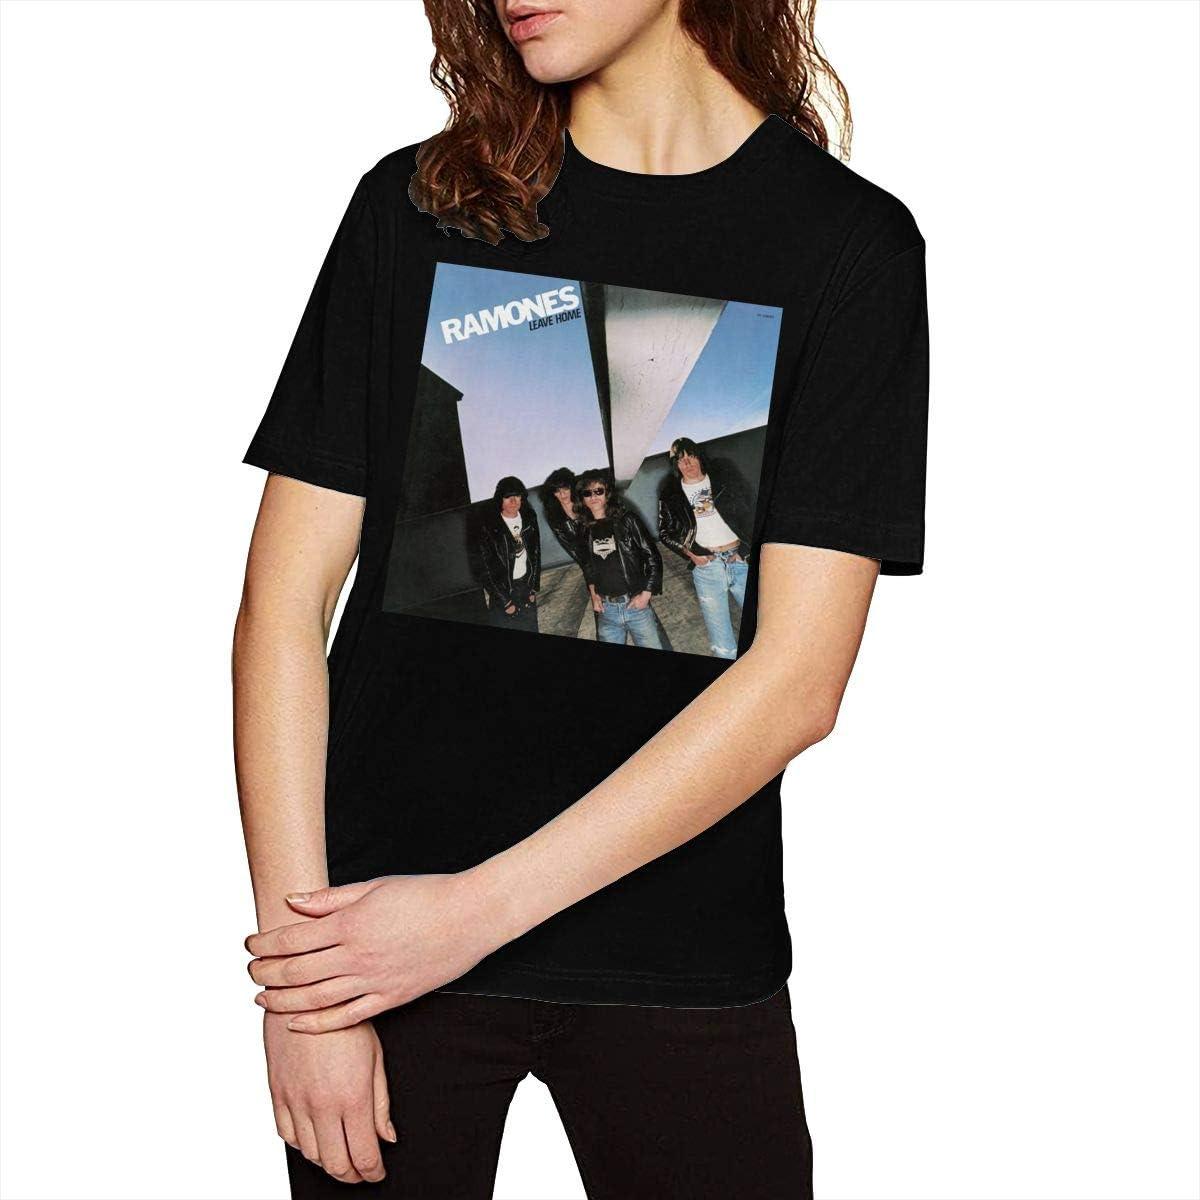 Ramones Leave Home Band Women's Shirt Classic Short Sleeve Gift T-Shirt